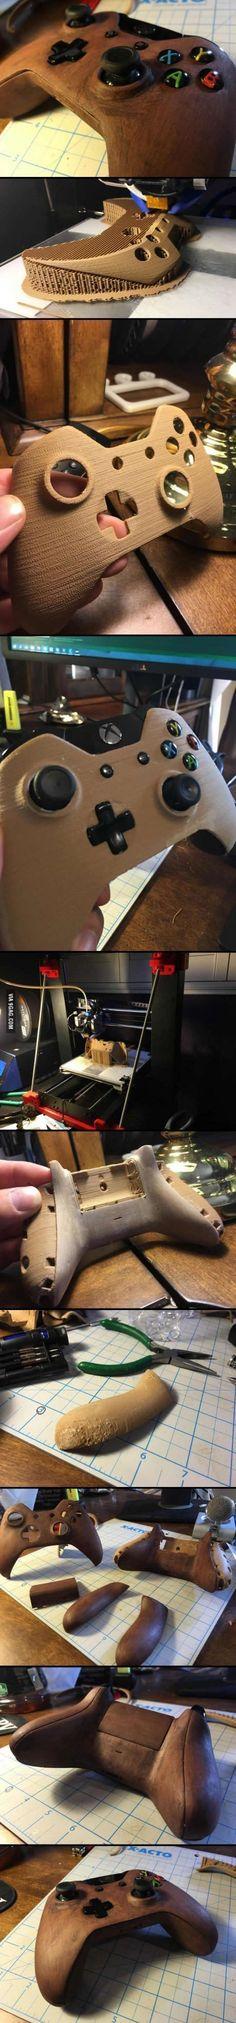 3D Printing Lesson Plan #3dprinterlessons